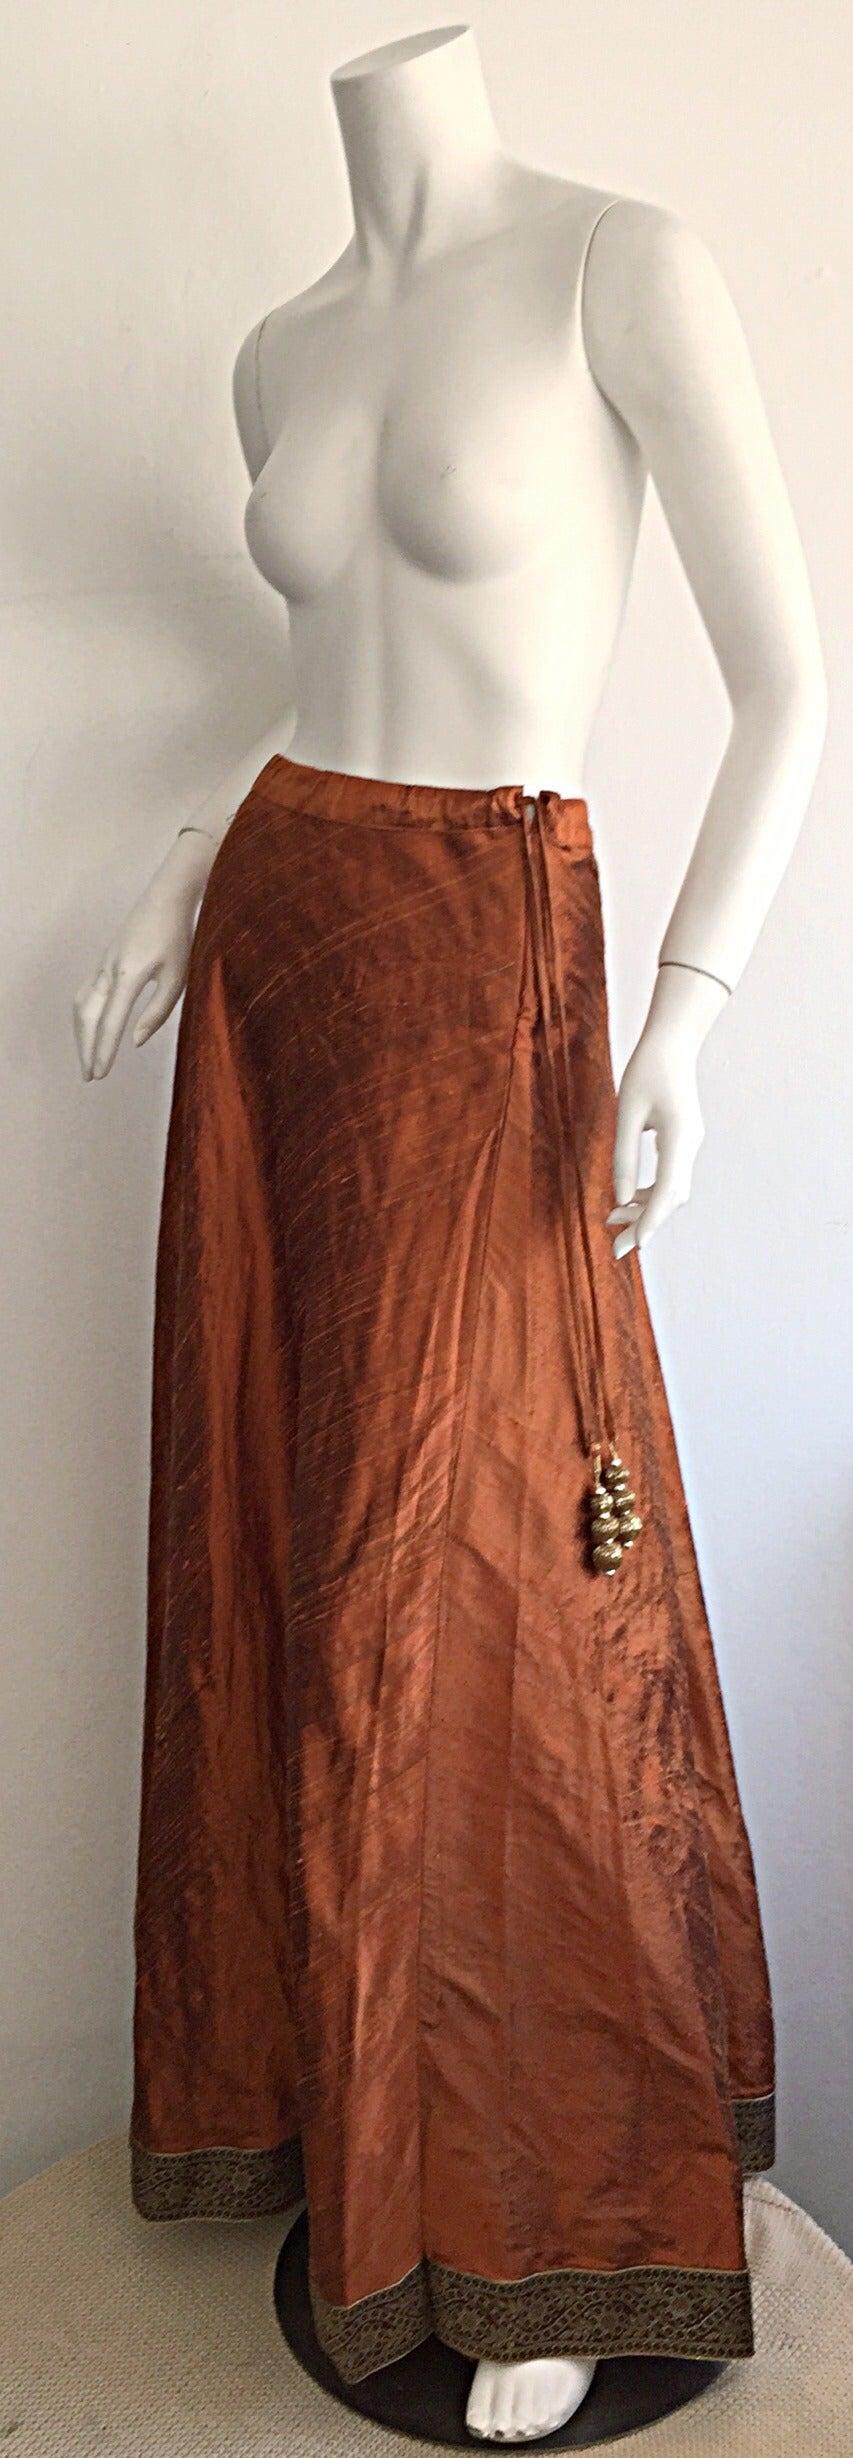 1970s Vintage Burnt Orange Raw Silk Indian Bohemian Tassel Maxi Skirt 4